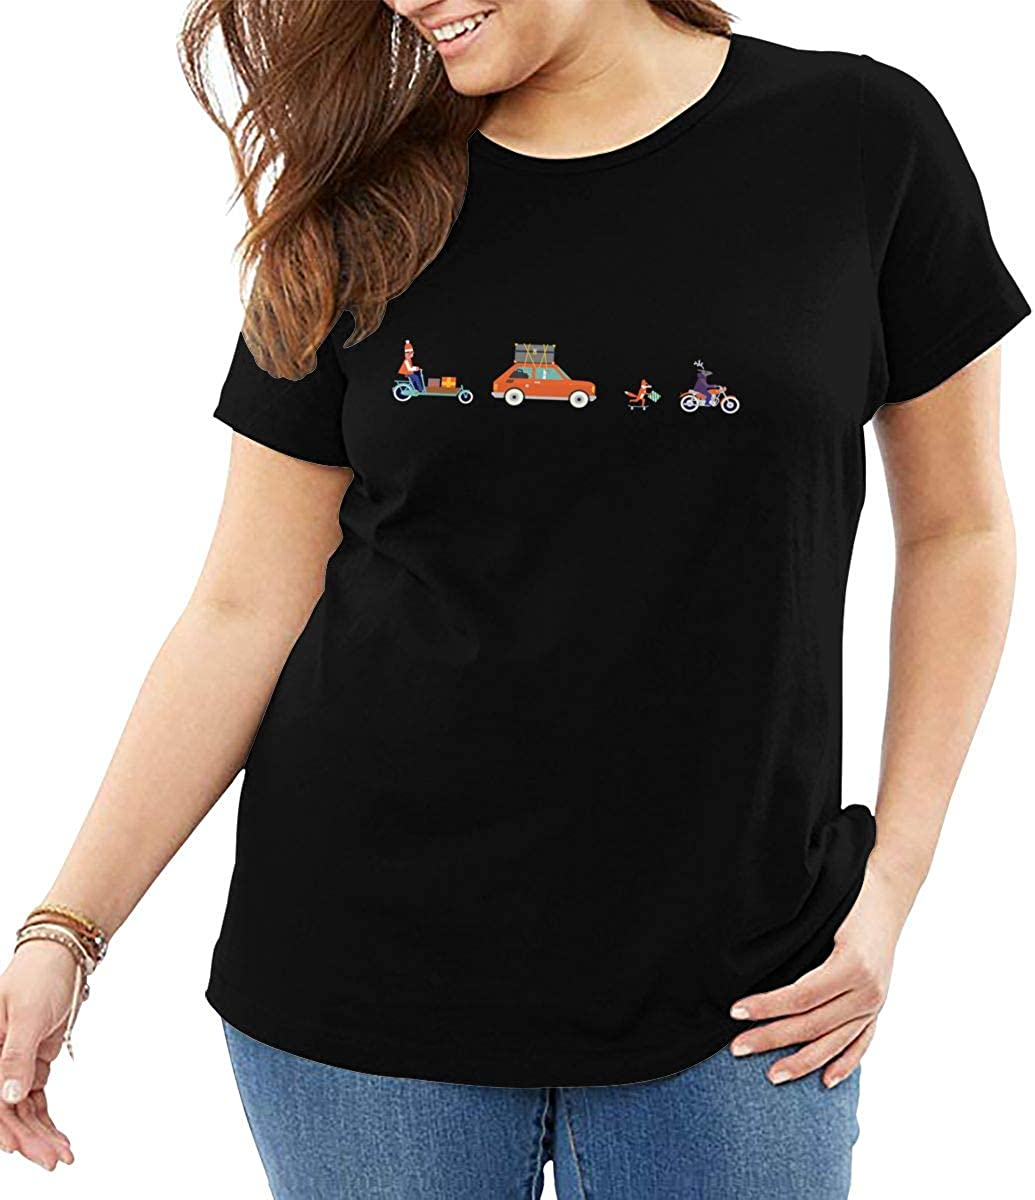 Amazon.com: Oversized T Shirts for Women Plus Size Shirts with ...